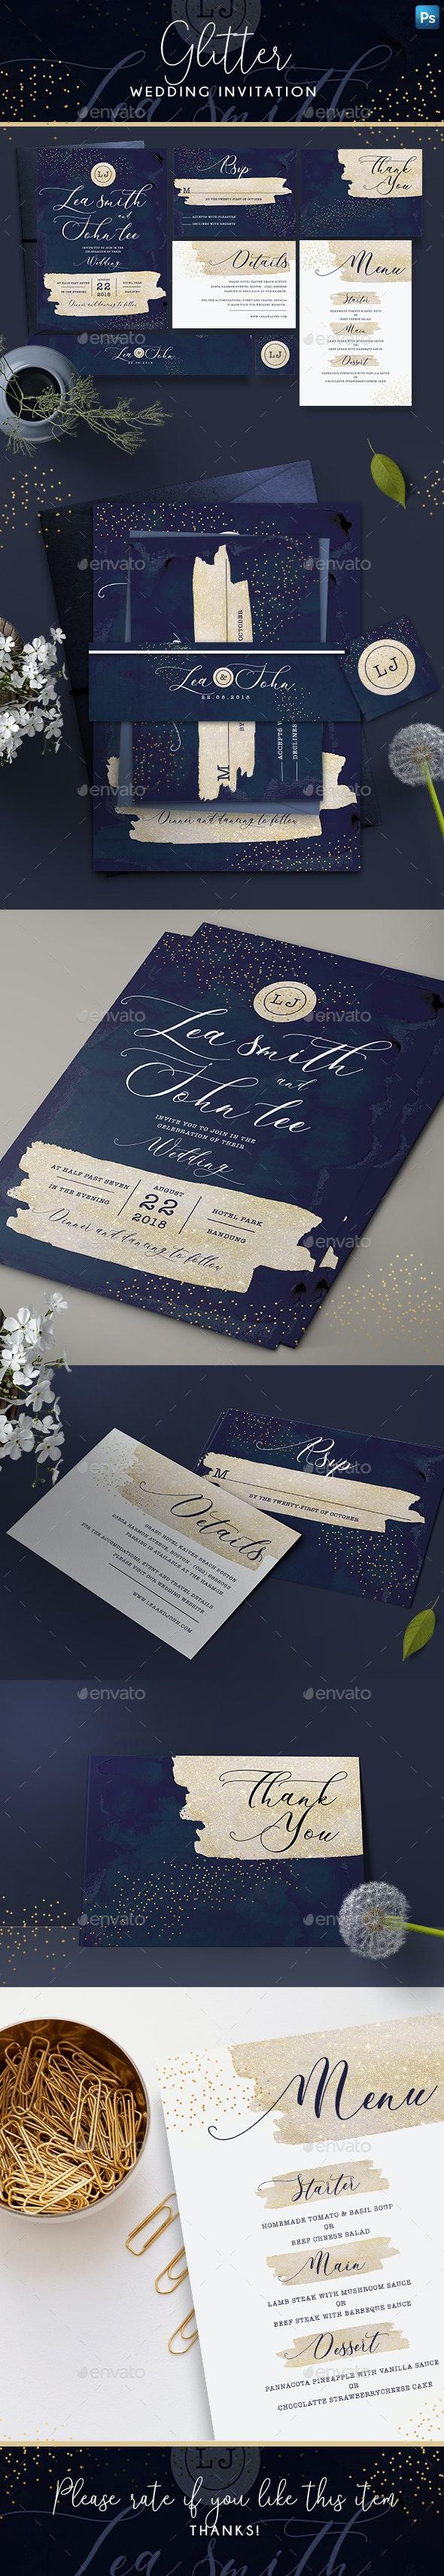 Glitter Wedding Invitation - Wedding Greeting Cards